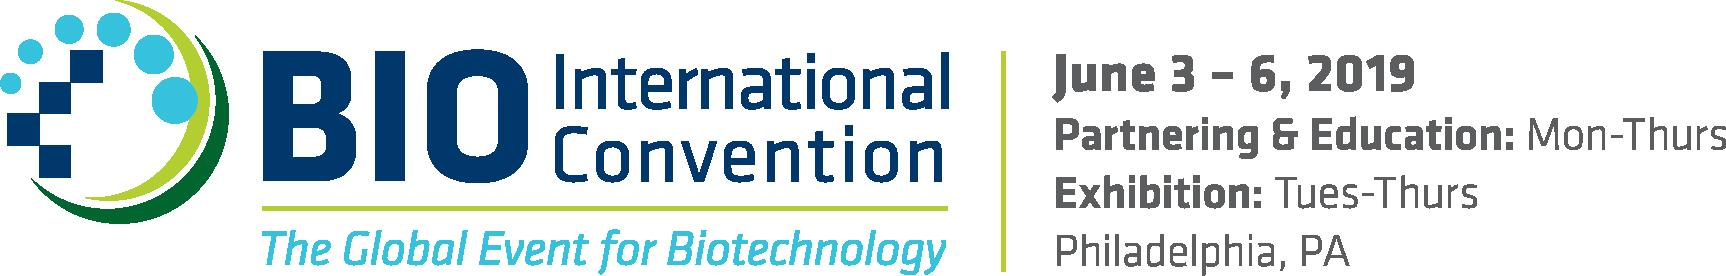 BIO International 2019